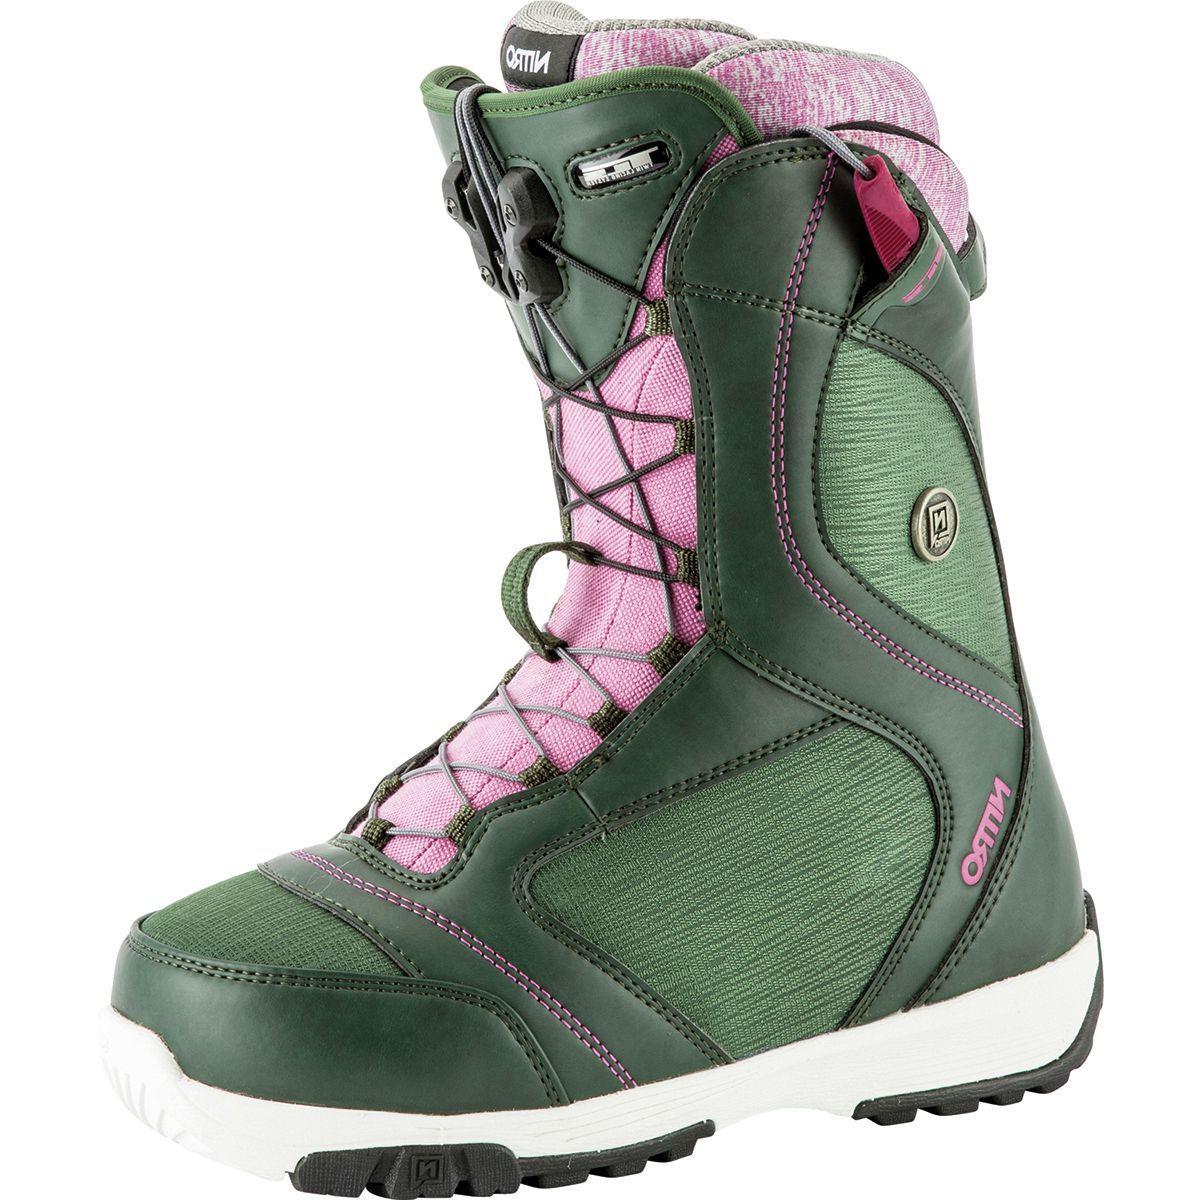 Nitro Monarch TLS Snowboard Boot - Women's